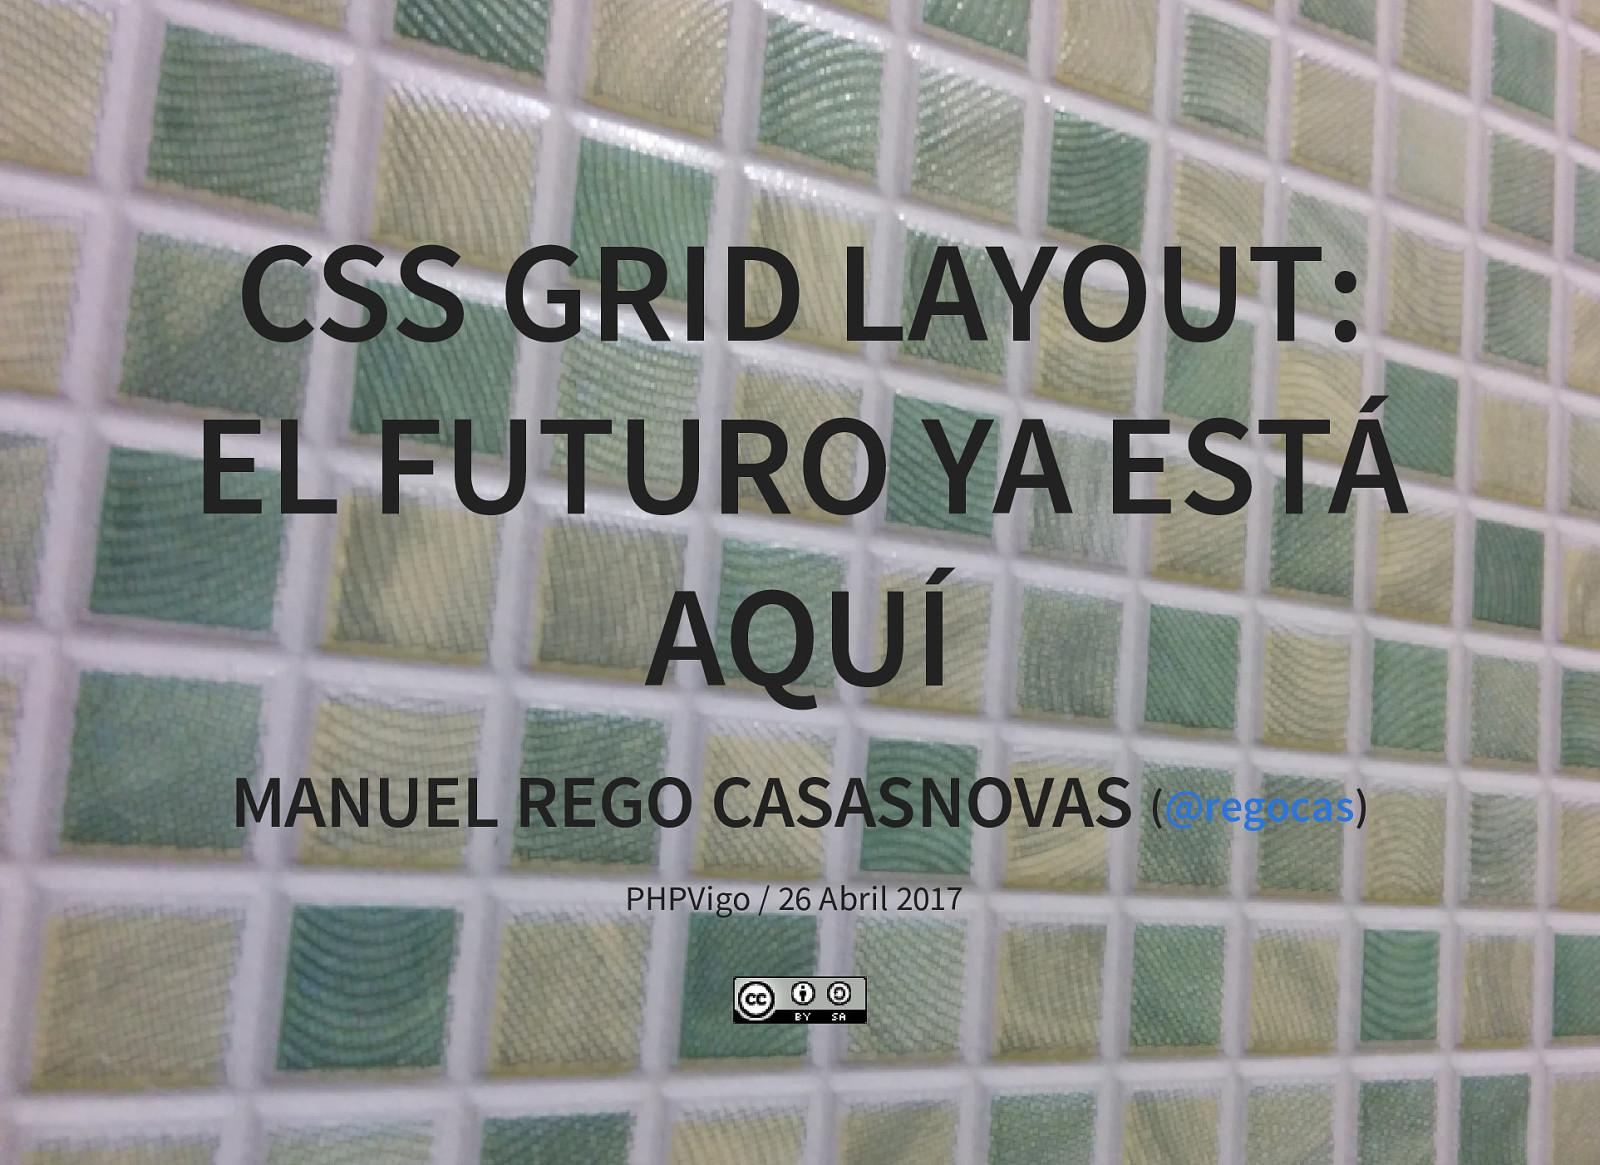 Spanish: CSS Grid Layout: El futuro ya está aquí